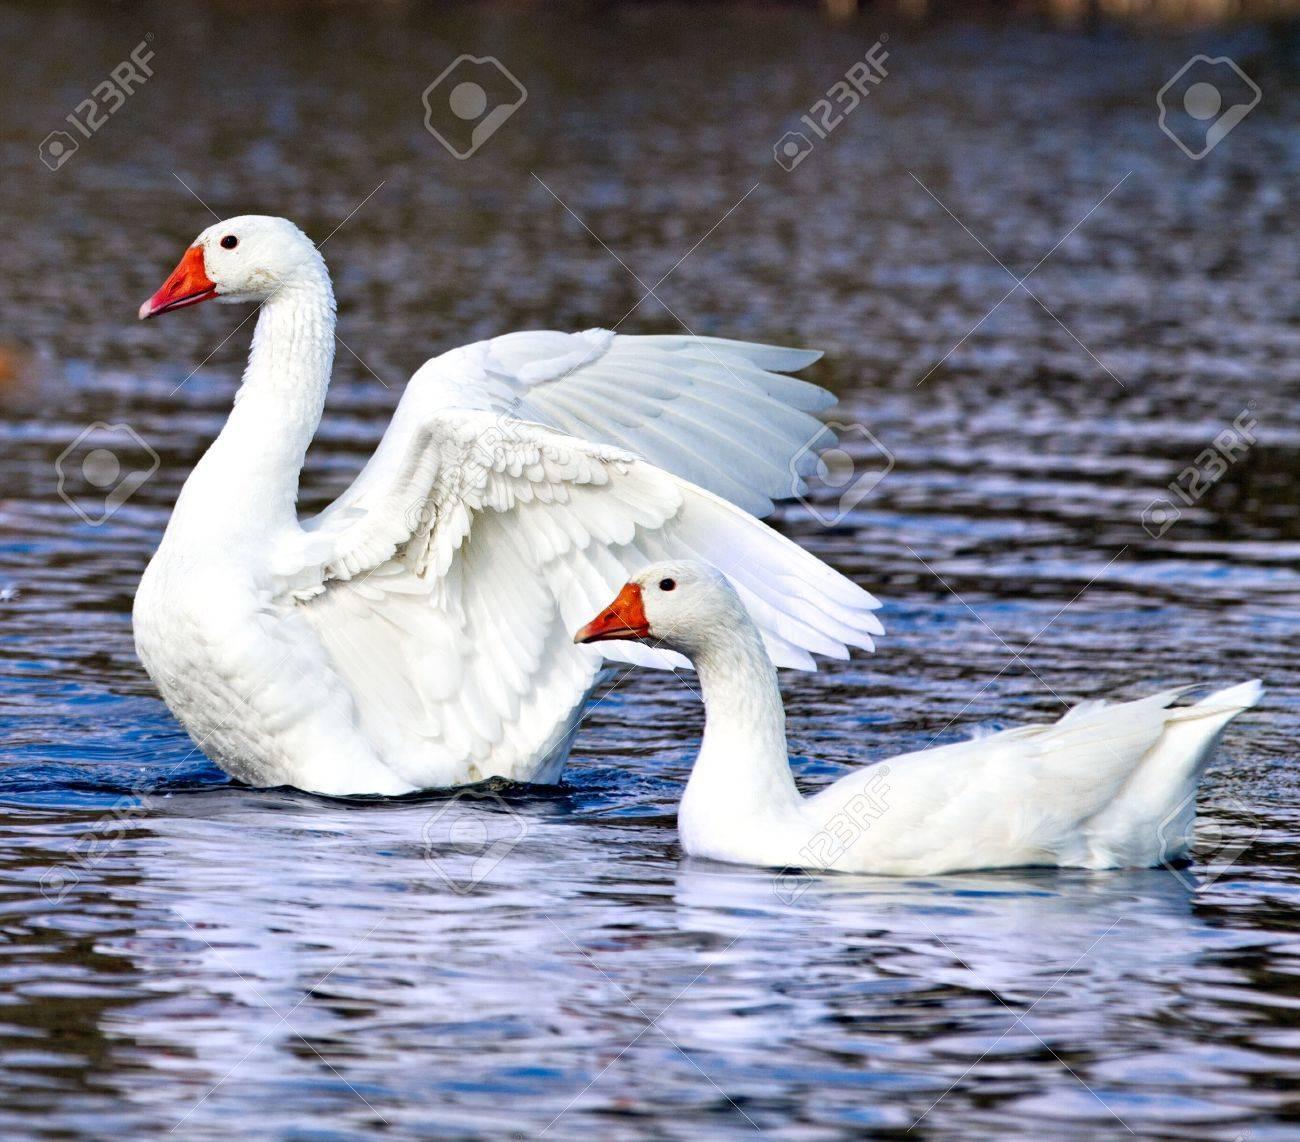 white ducks on the river Stock Photo - 19296784